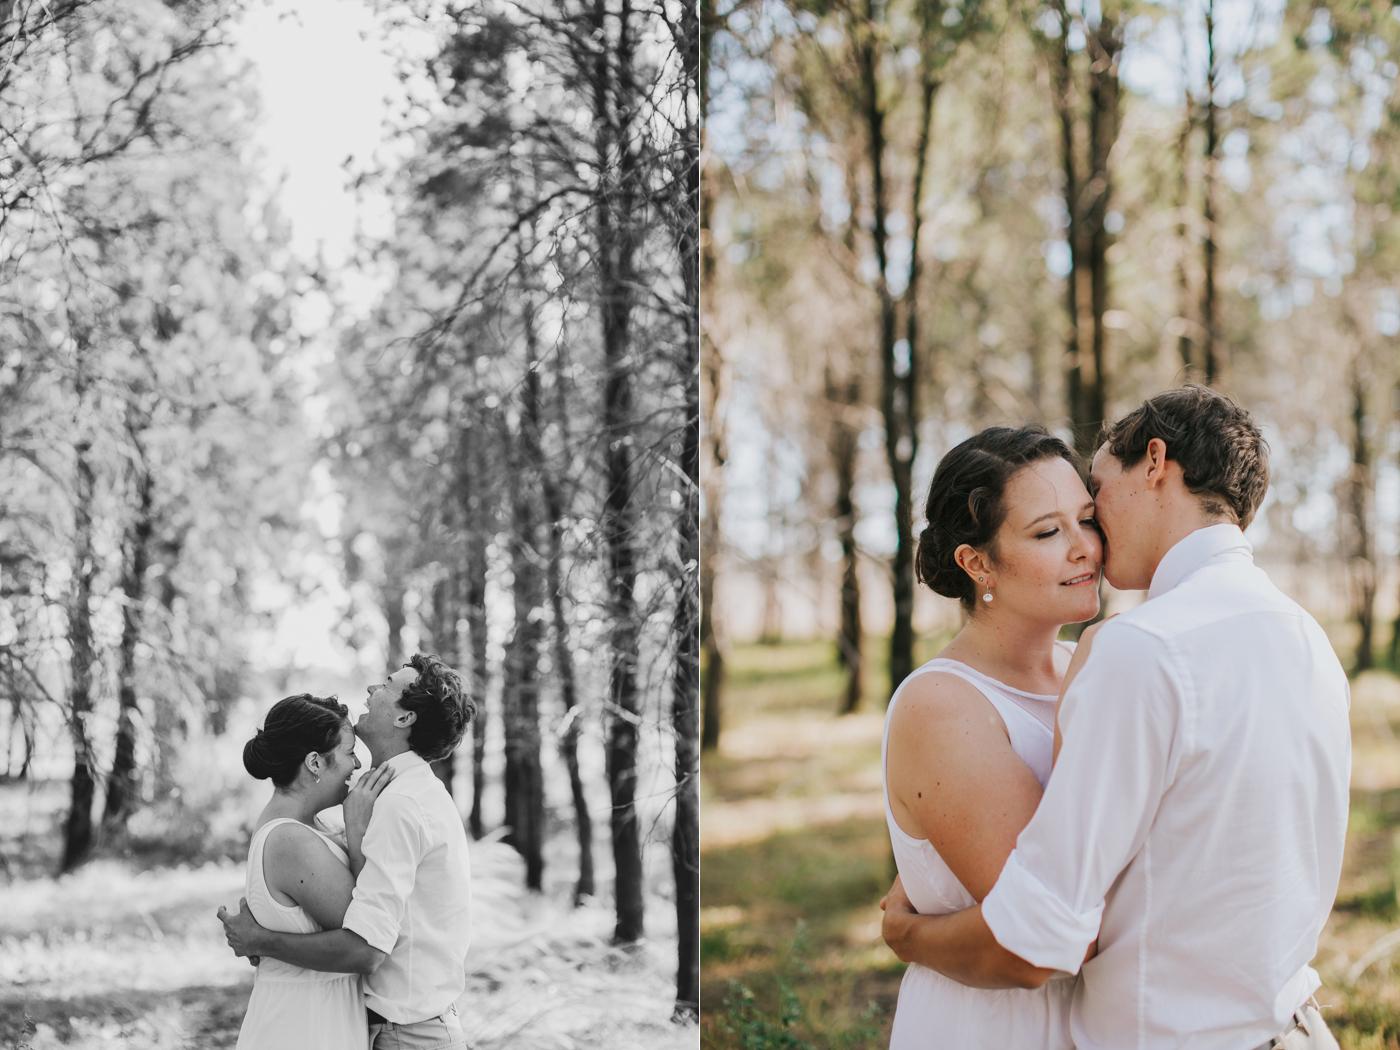 Nicolle & Jacob - Dubbo Wedding - Country Australia - Samantha Heather Photography-182.jpg